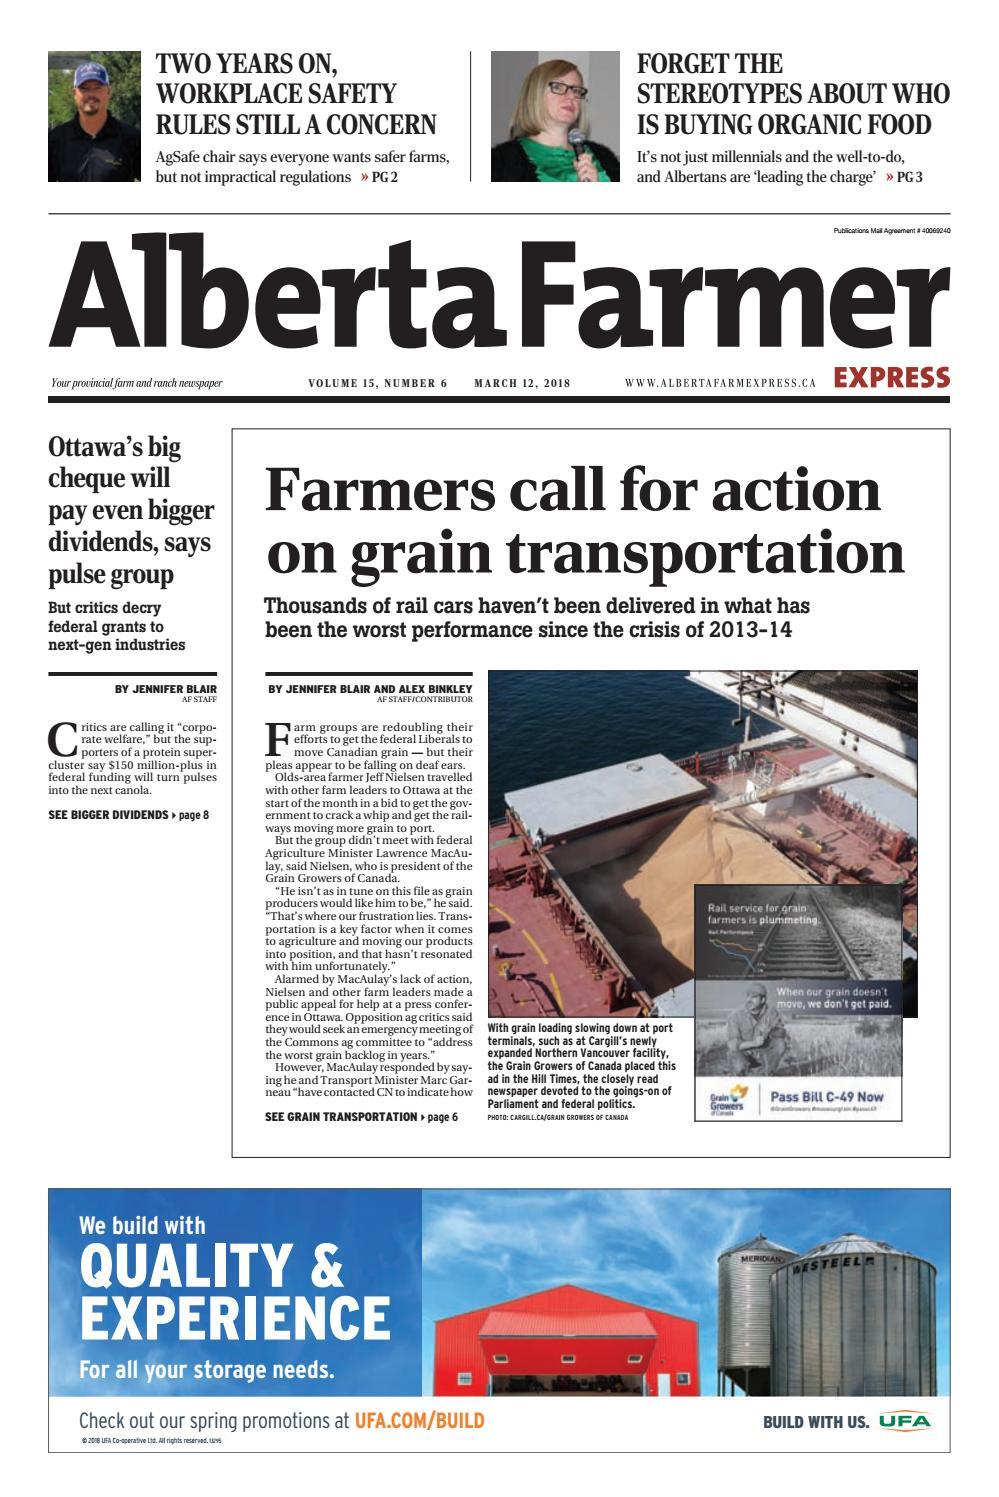 Alberta Farmer Express By Farm Business Communications Issuu Titan Toro 5200 Wiring Diagram